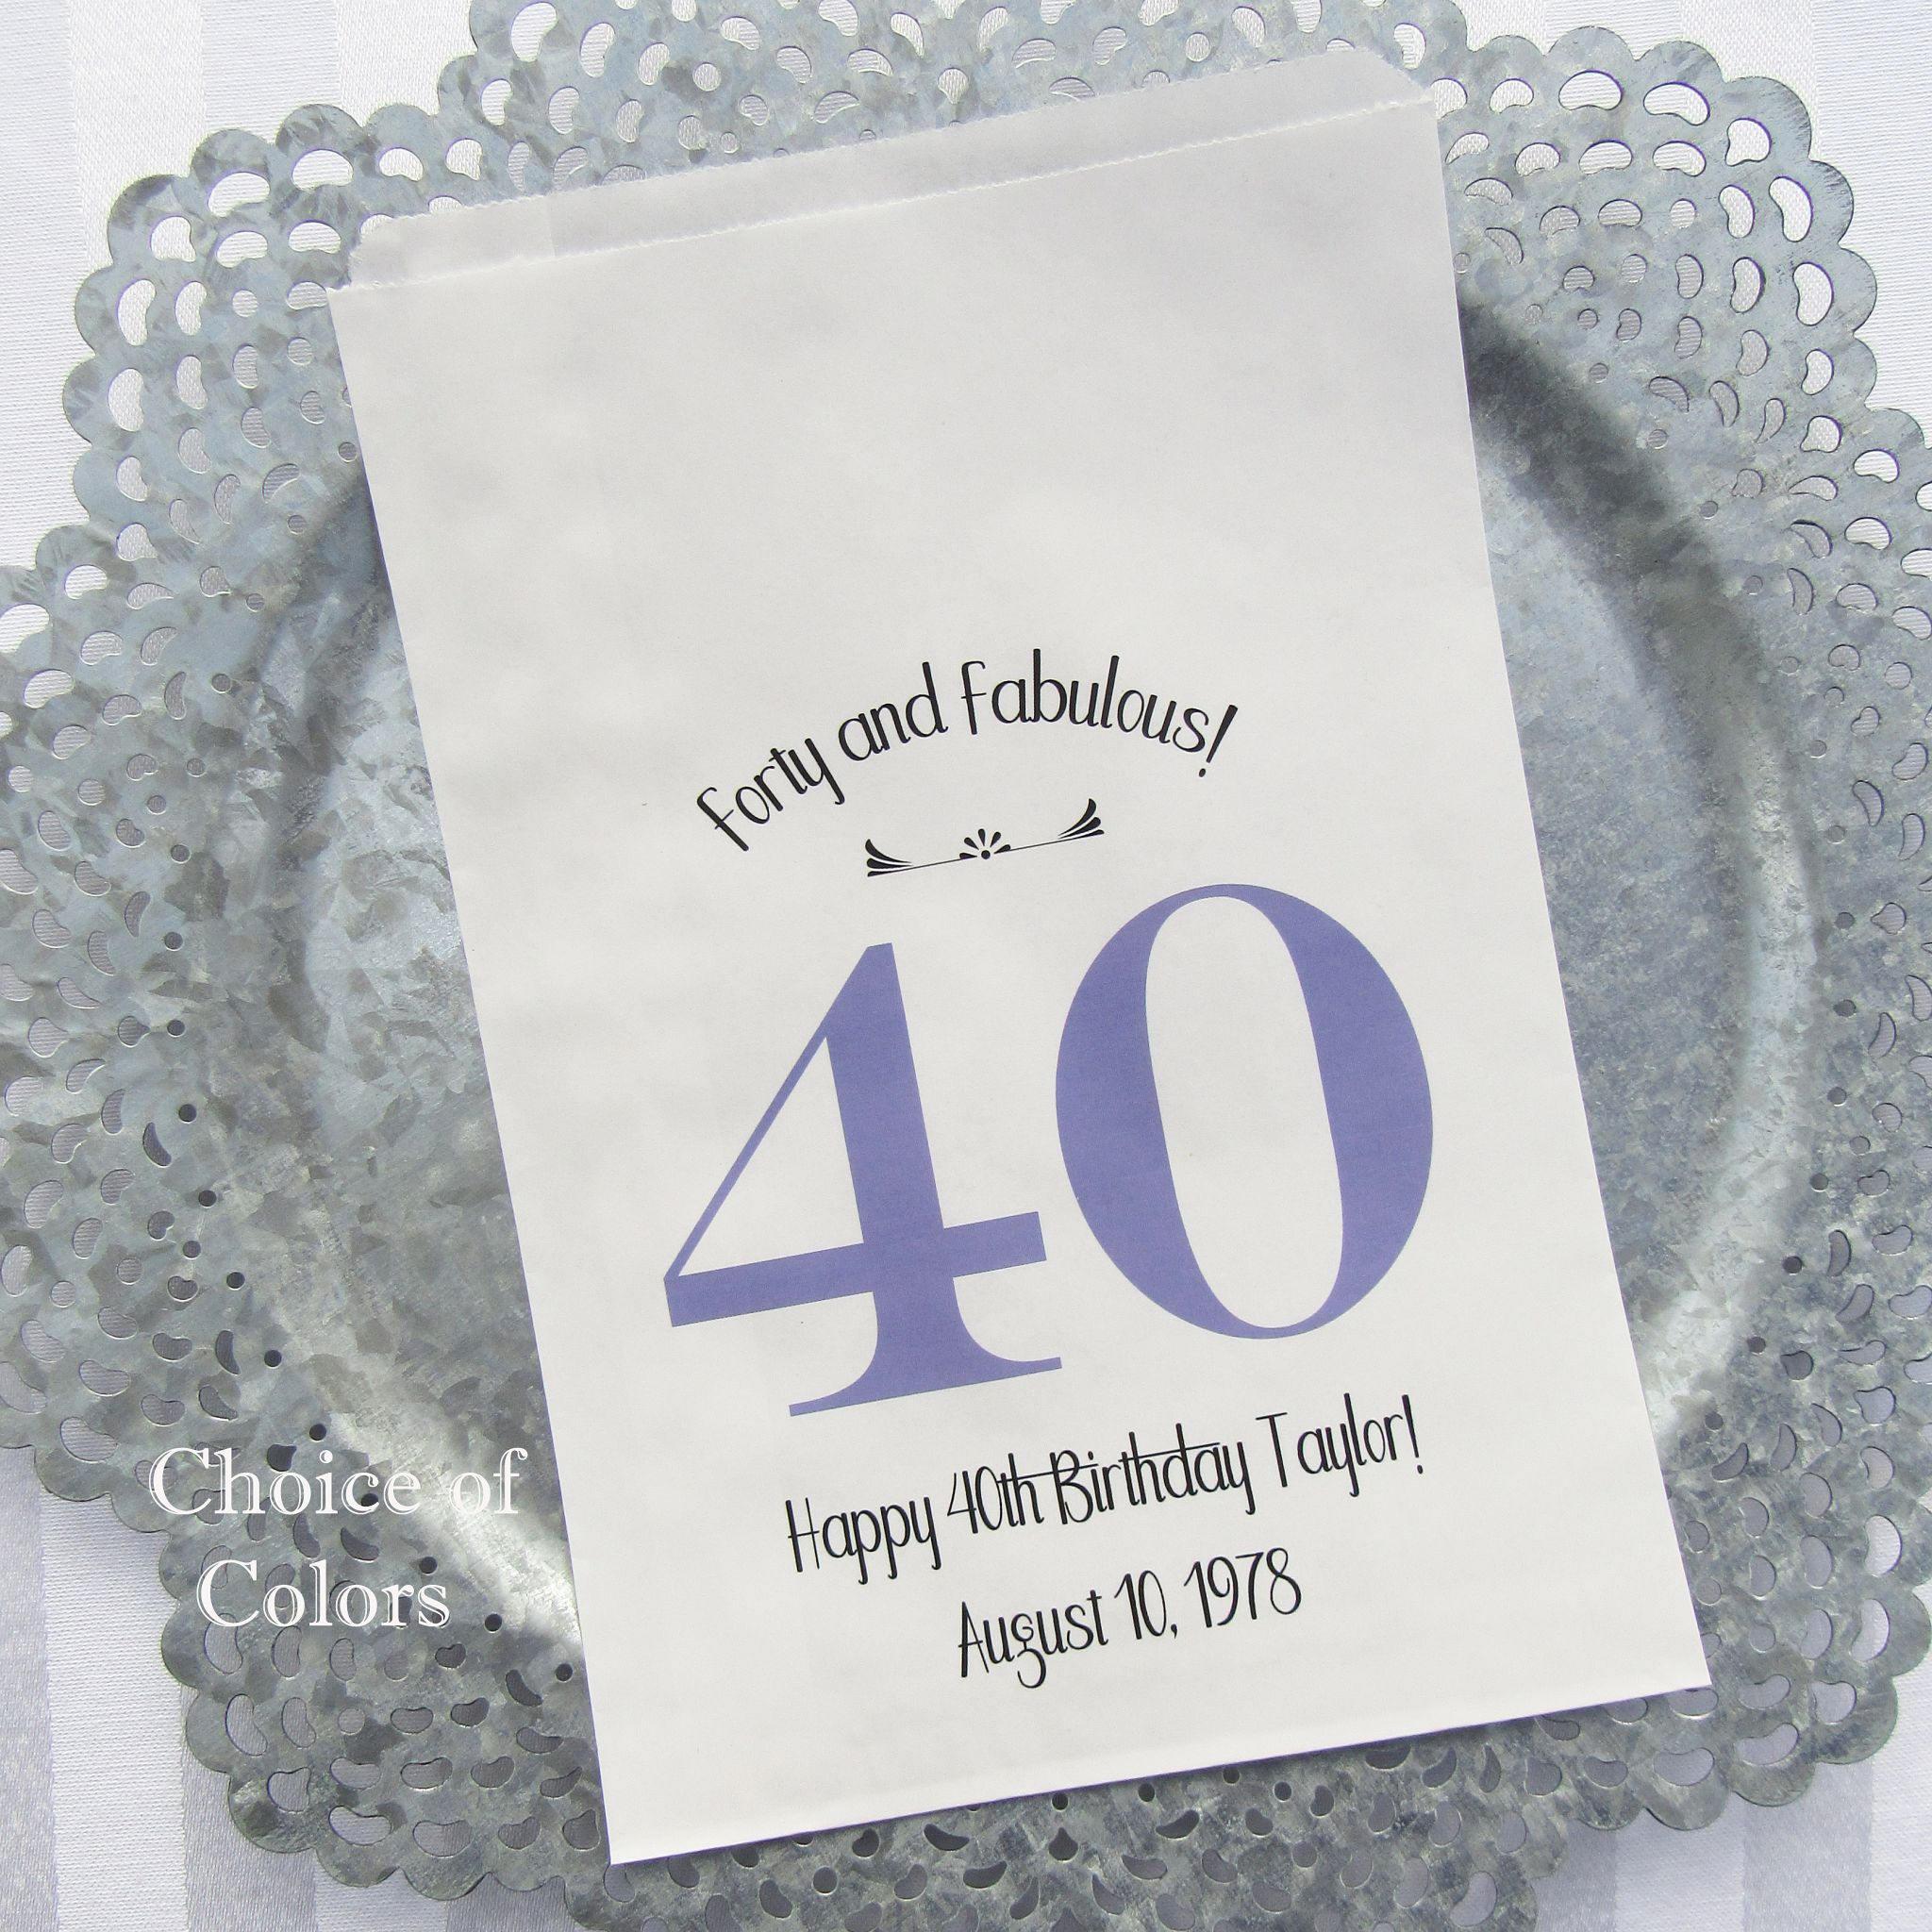 Jam Wedding Favors Set Of 12 | Giftwedding.co